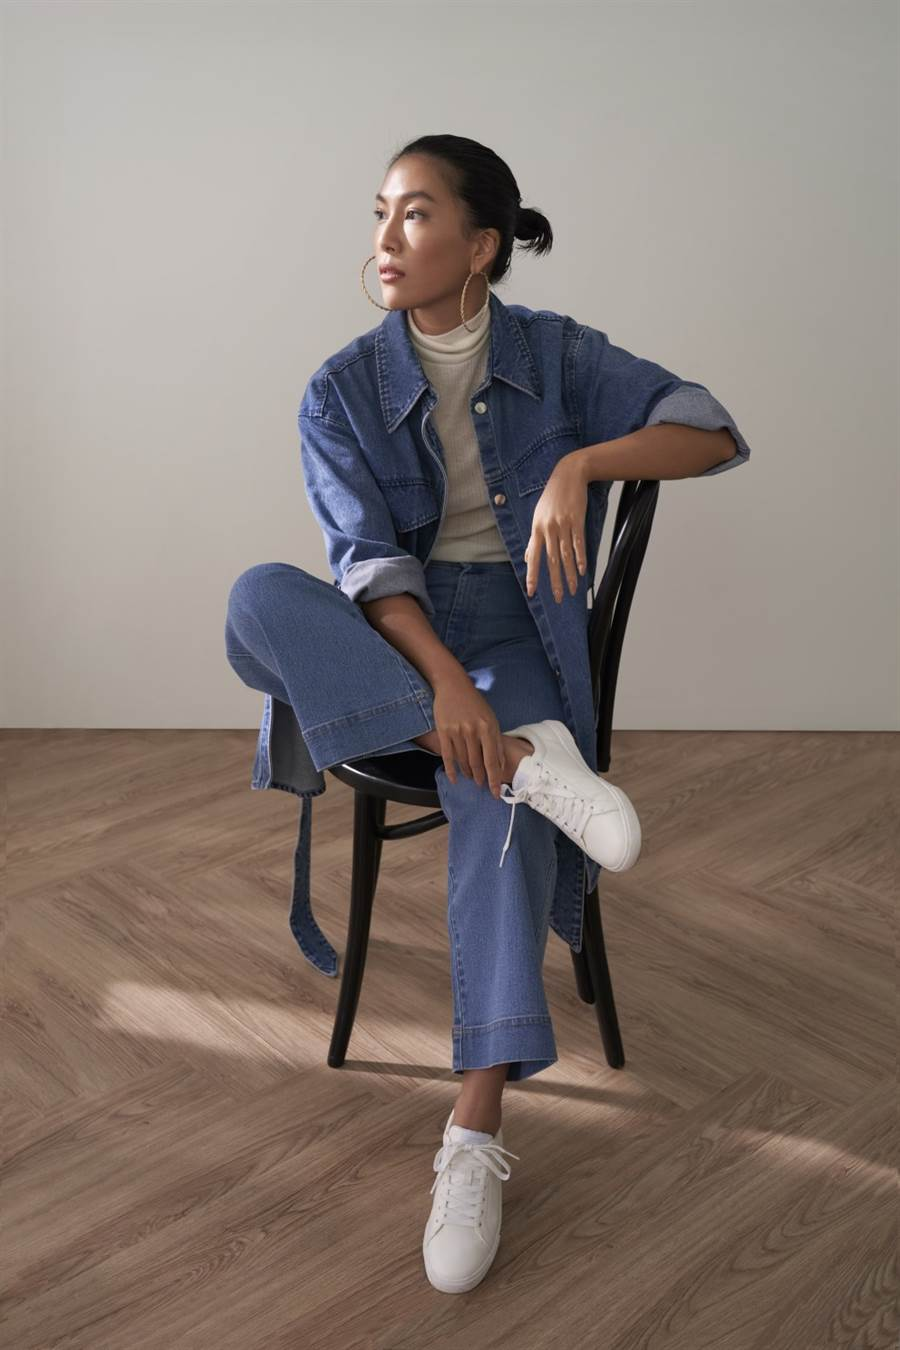 H&M2020秋季女装系列携手莫莉,打破刻板规定呈现崭新面目!